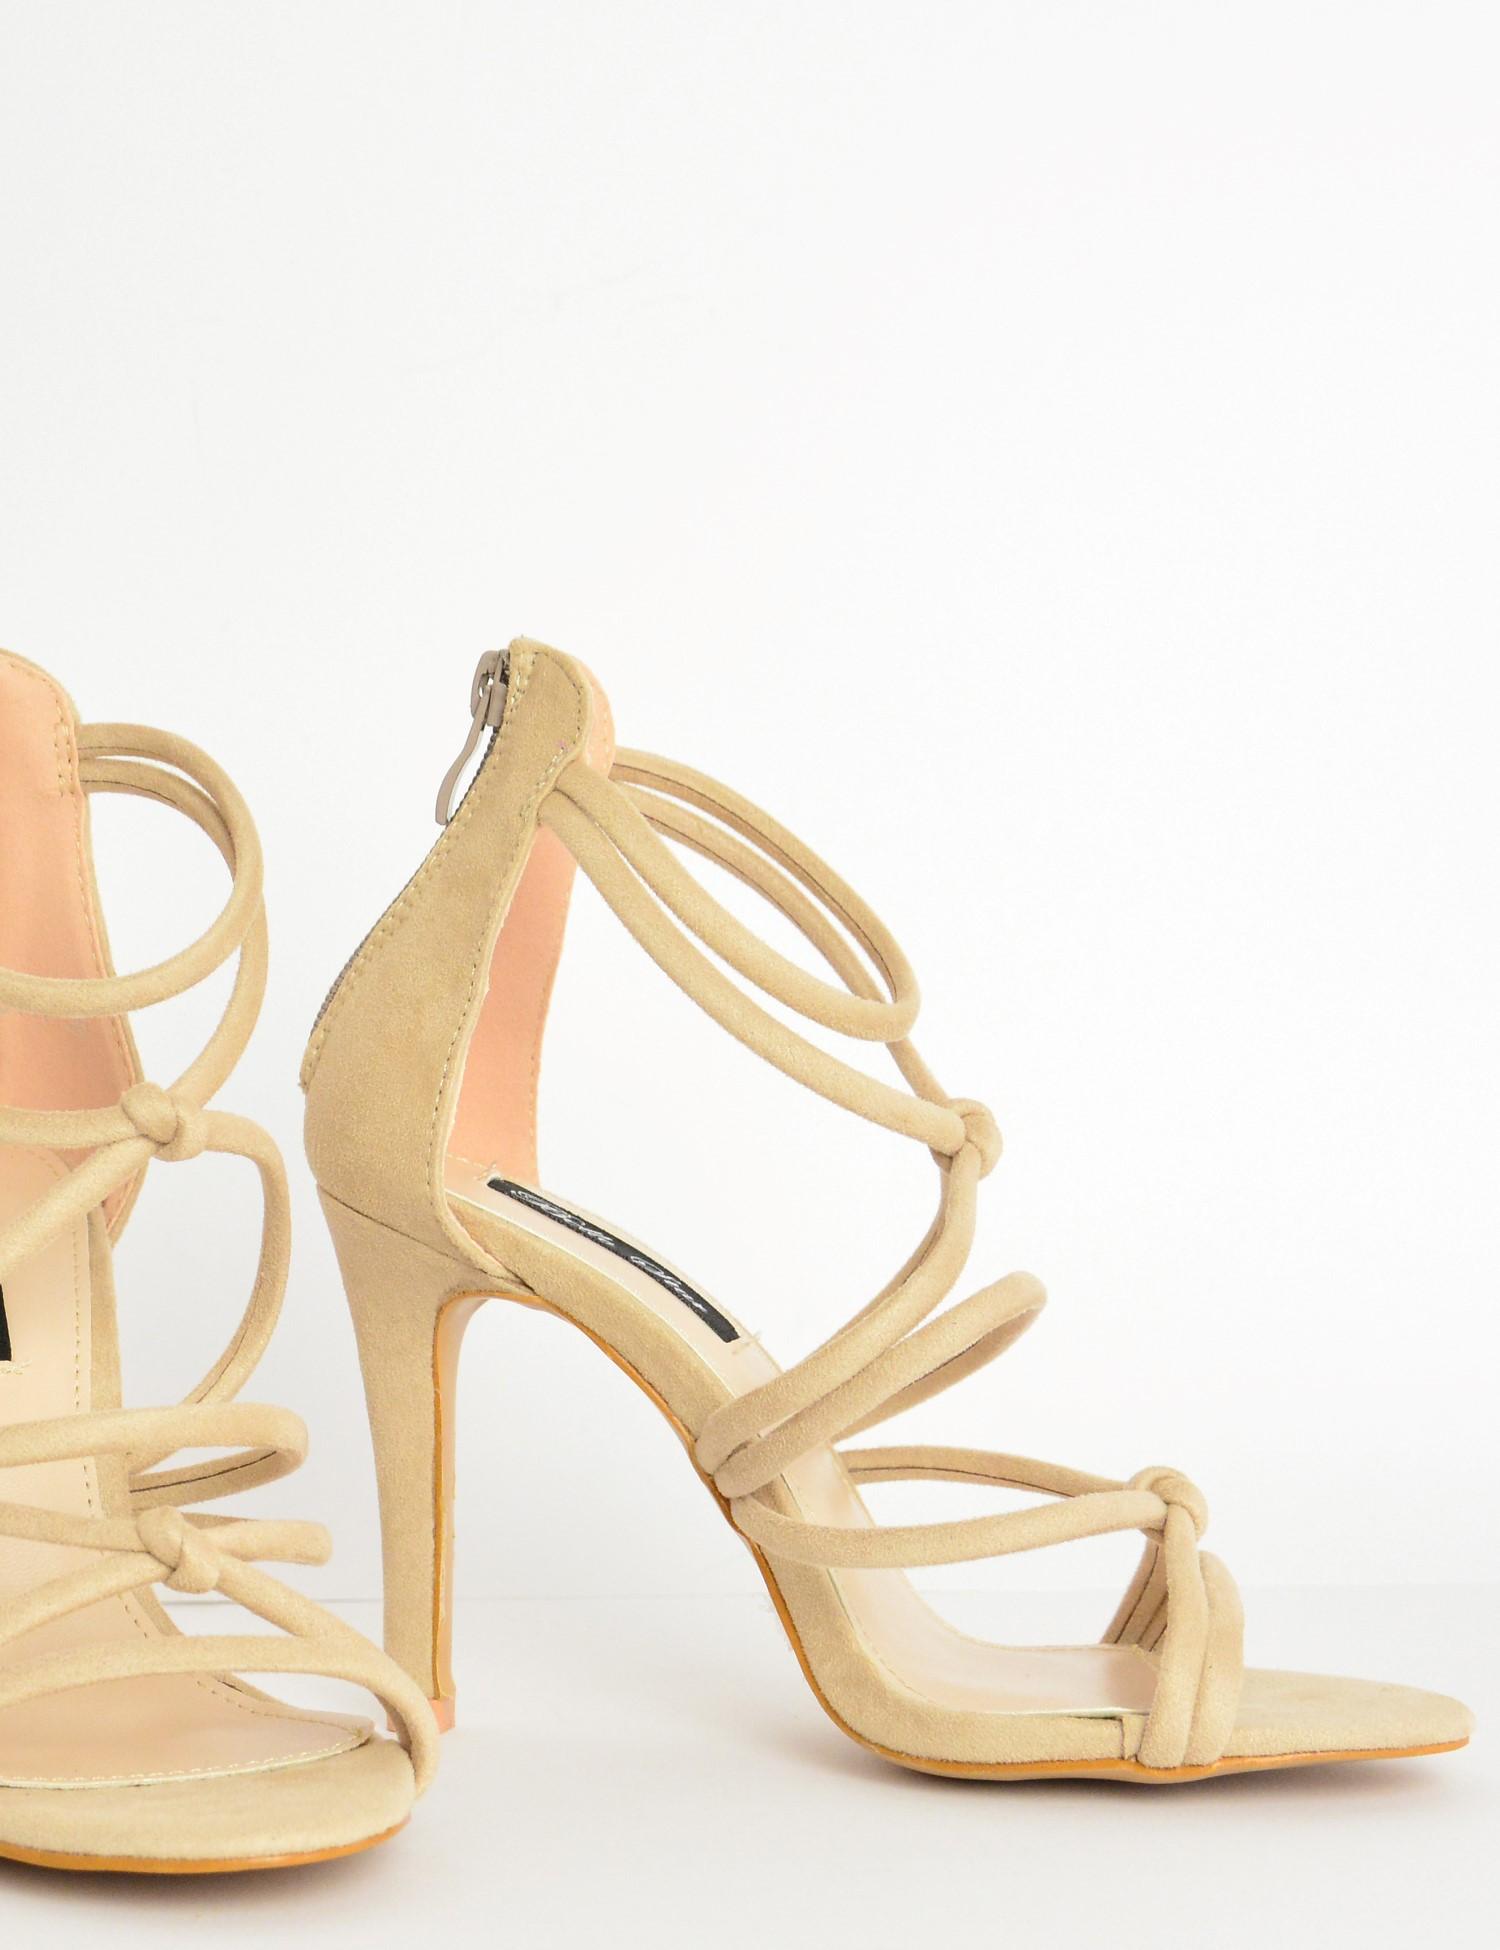 01c26a6860b Γυναικεία πέδιλα καστόρ με laces ψηλοτάκουνα μπεζ L6117G